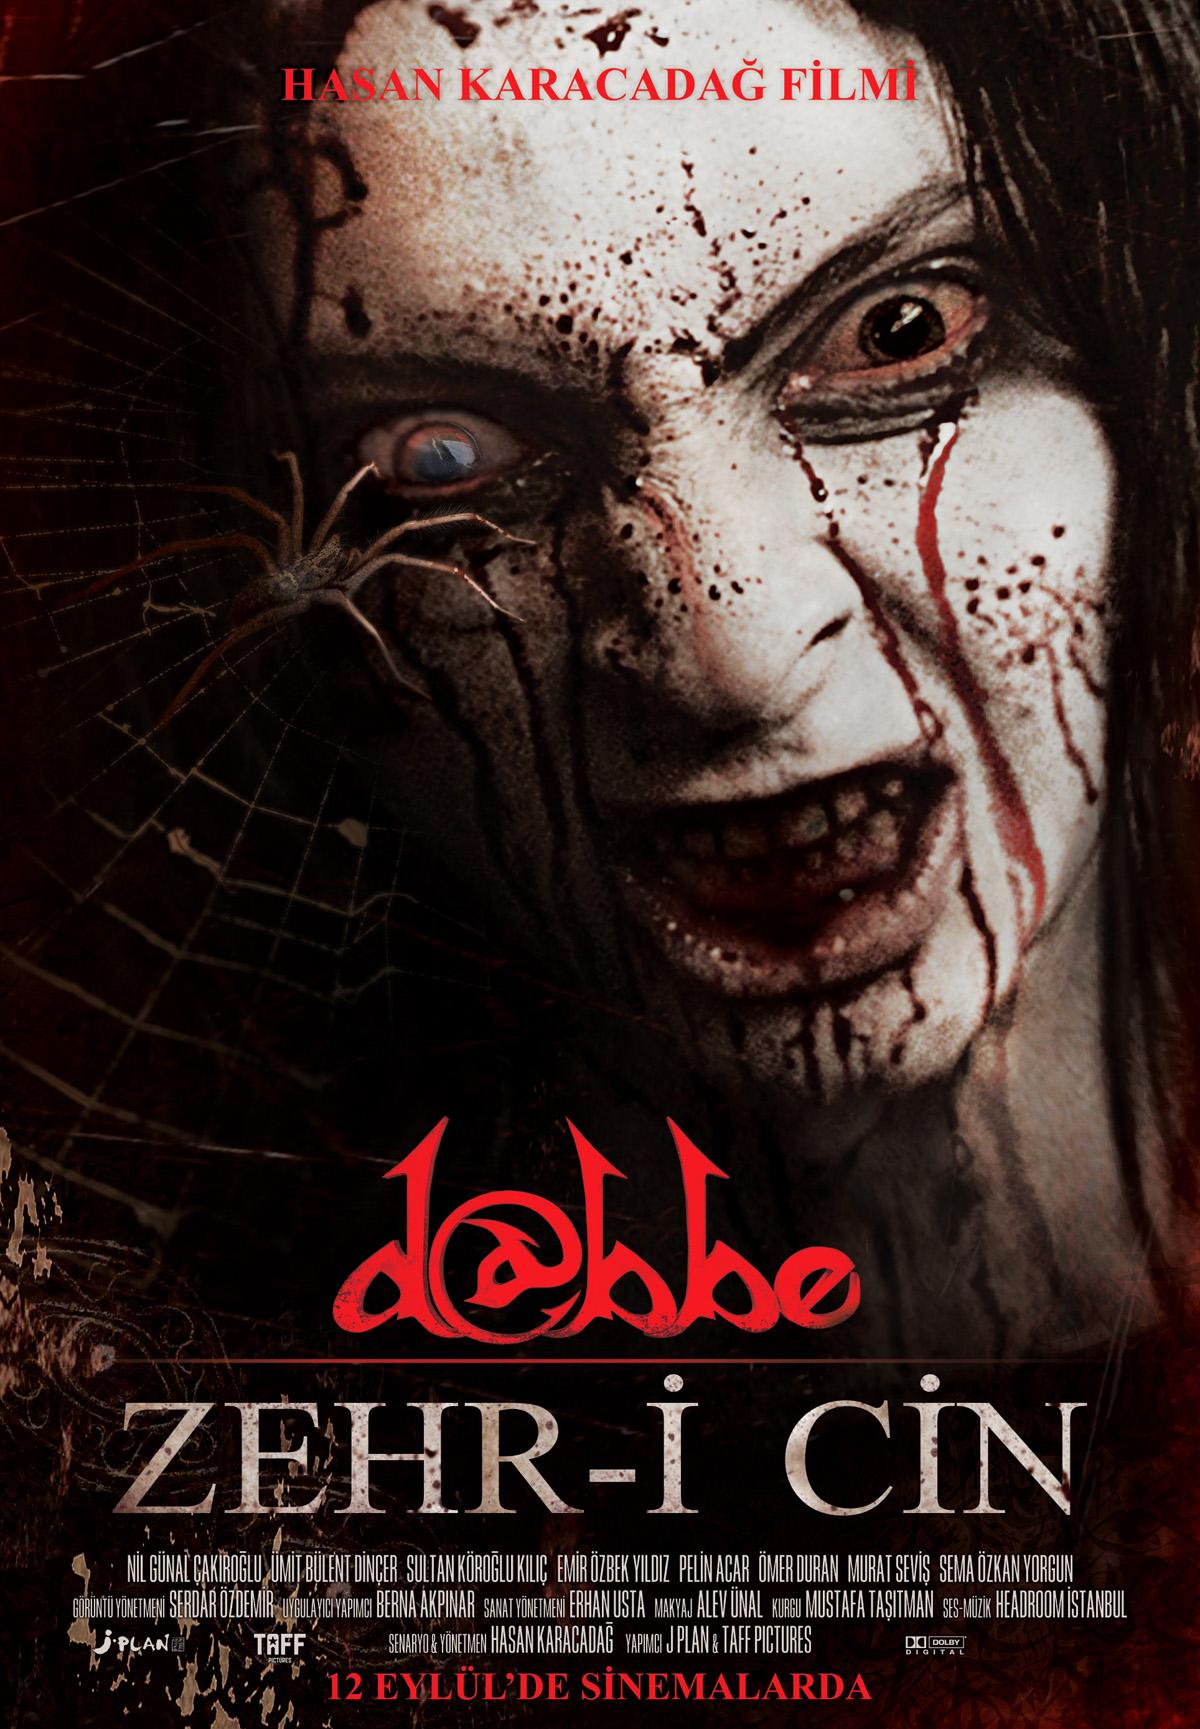 Dabbe 5: Zehr-i Cin 2014 izle - Online Film izle